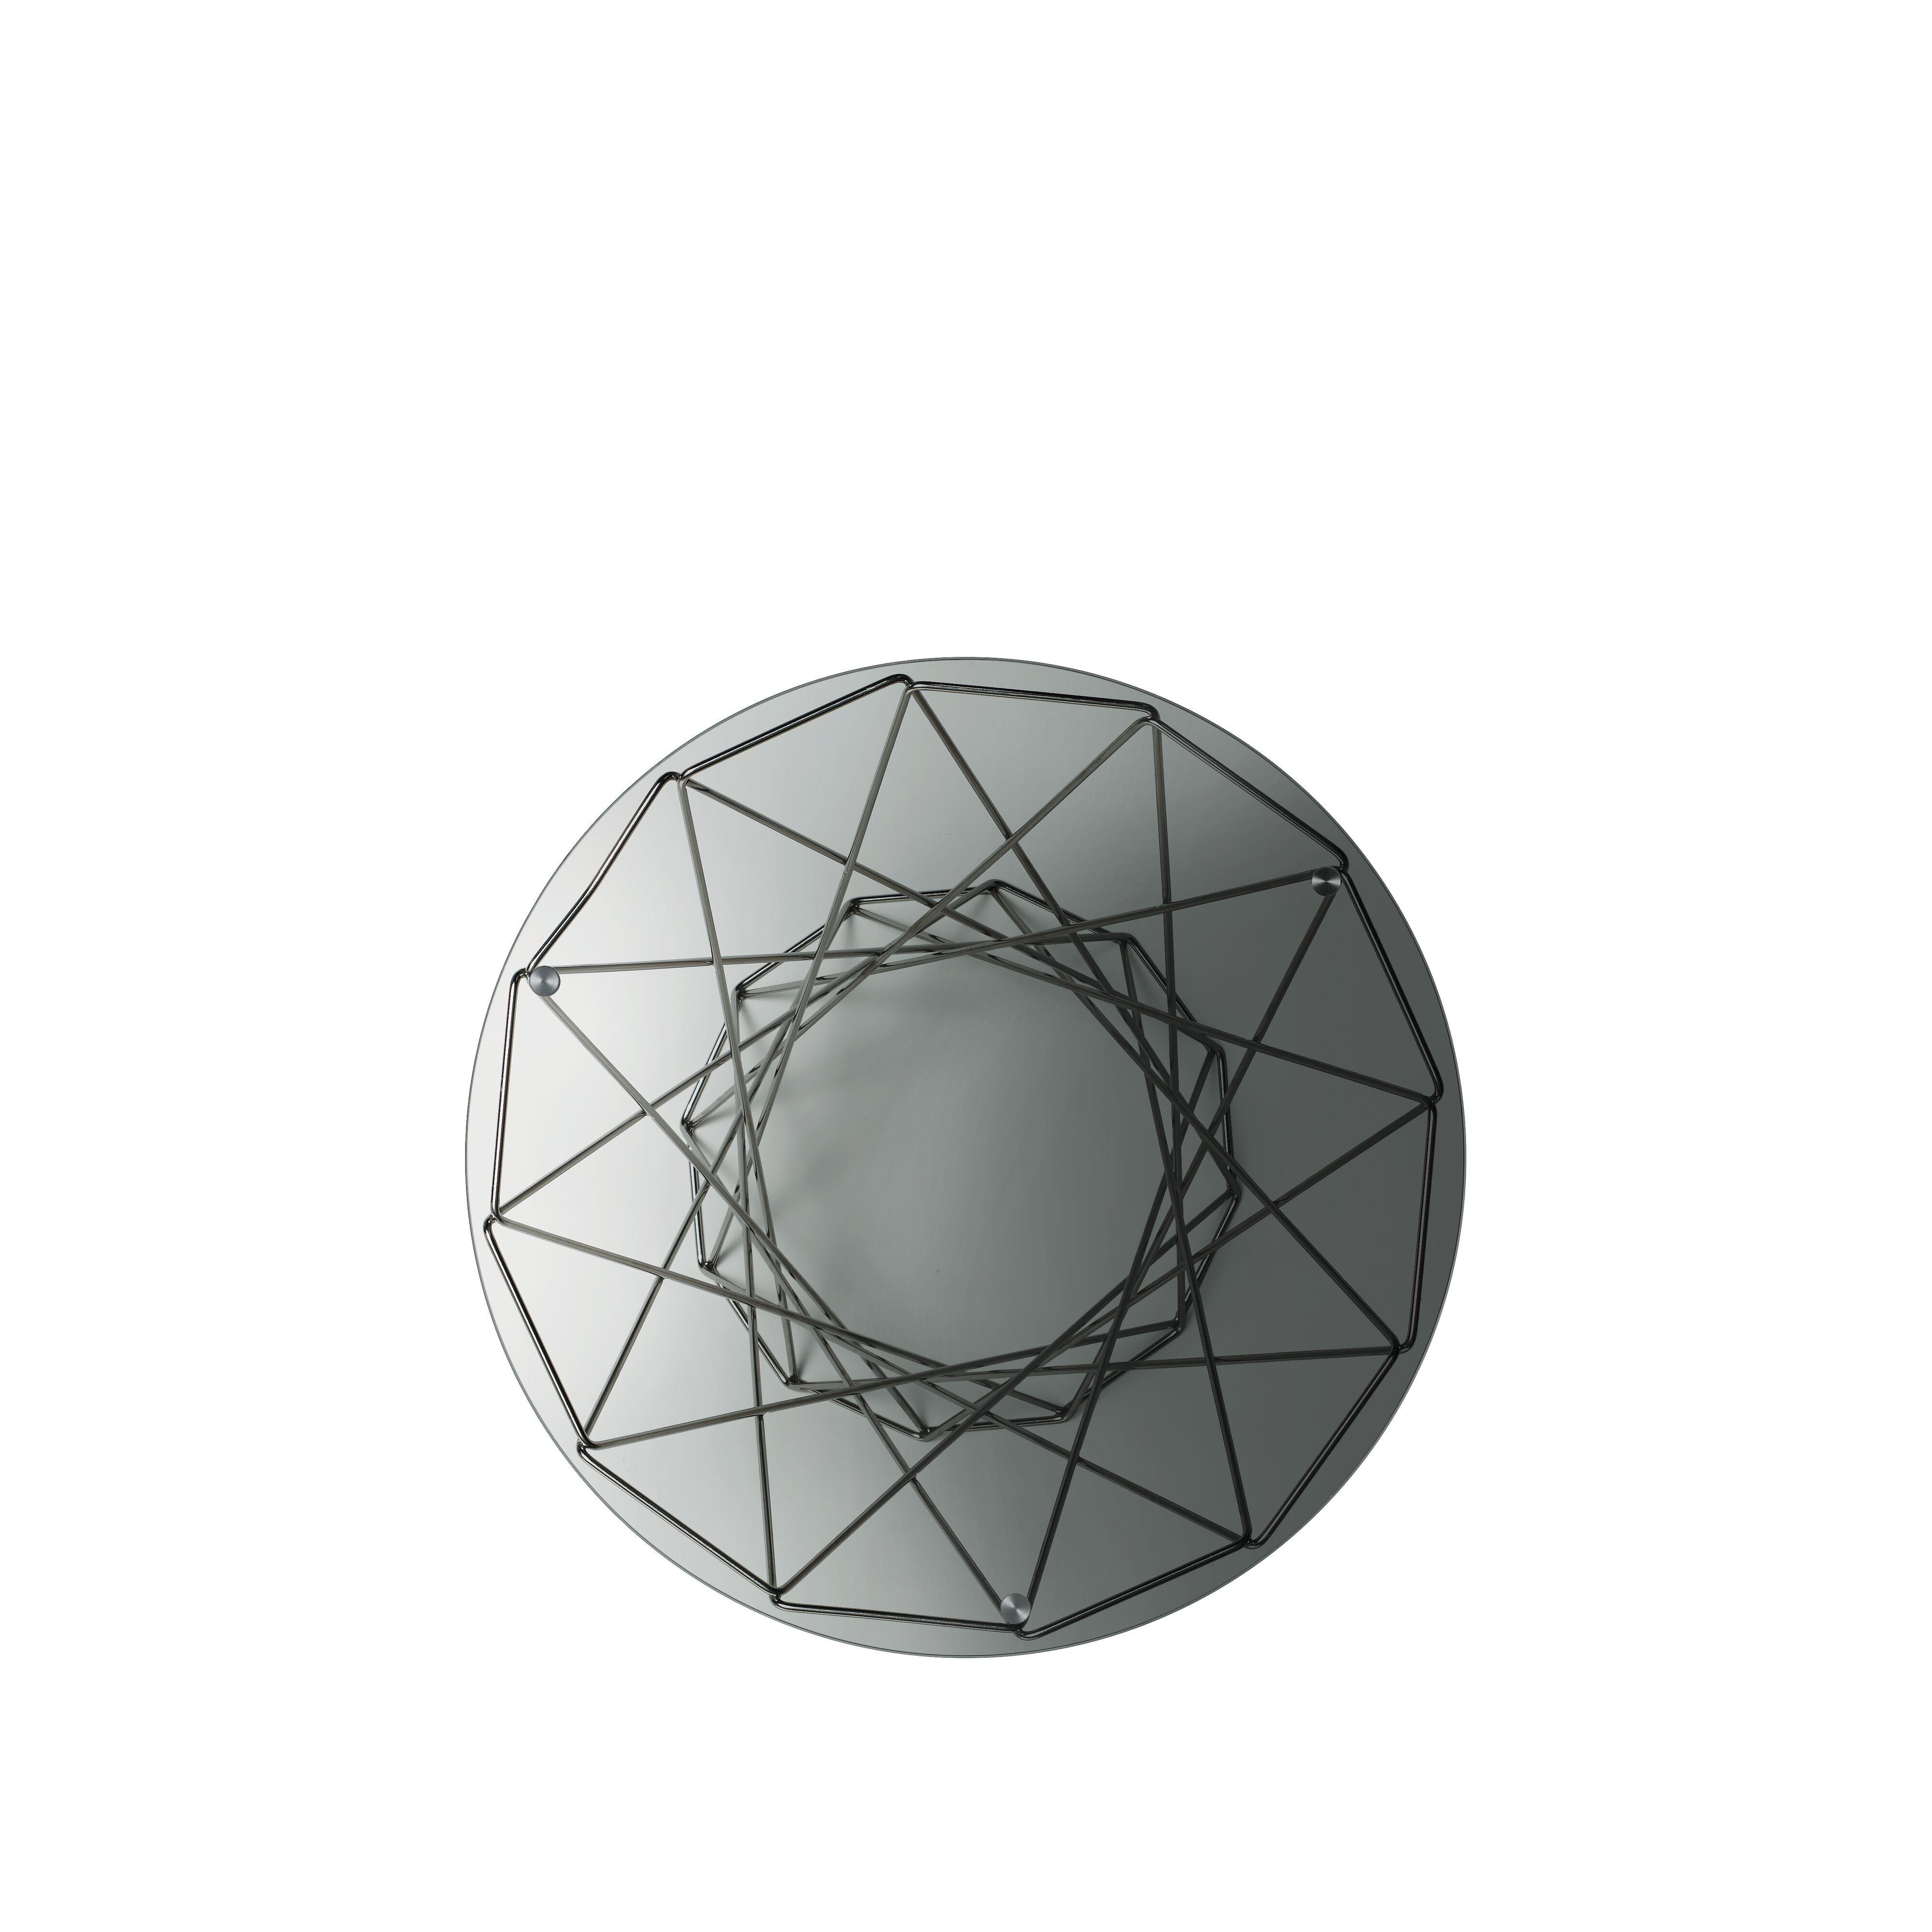 03-WK-Oota_Table-0004-H.tif